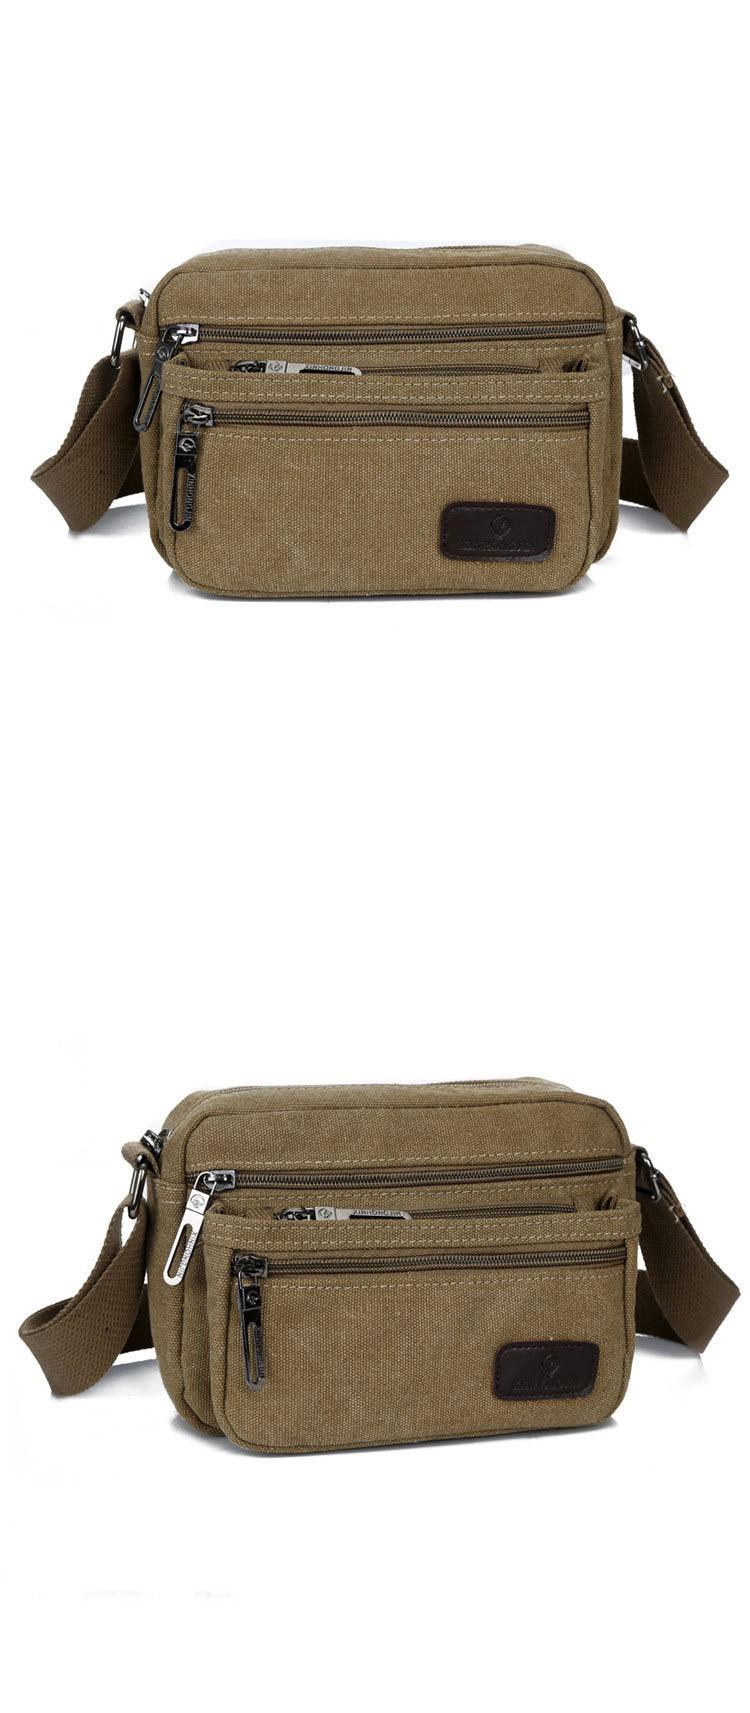 New Men Women Fashion Casual Satchel Outdoor Sport Canvas Messenger Shoulder Bag